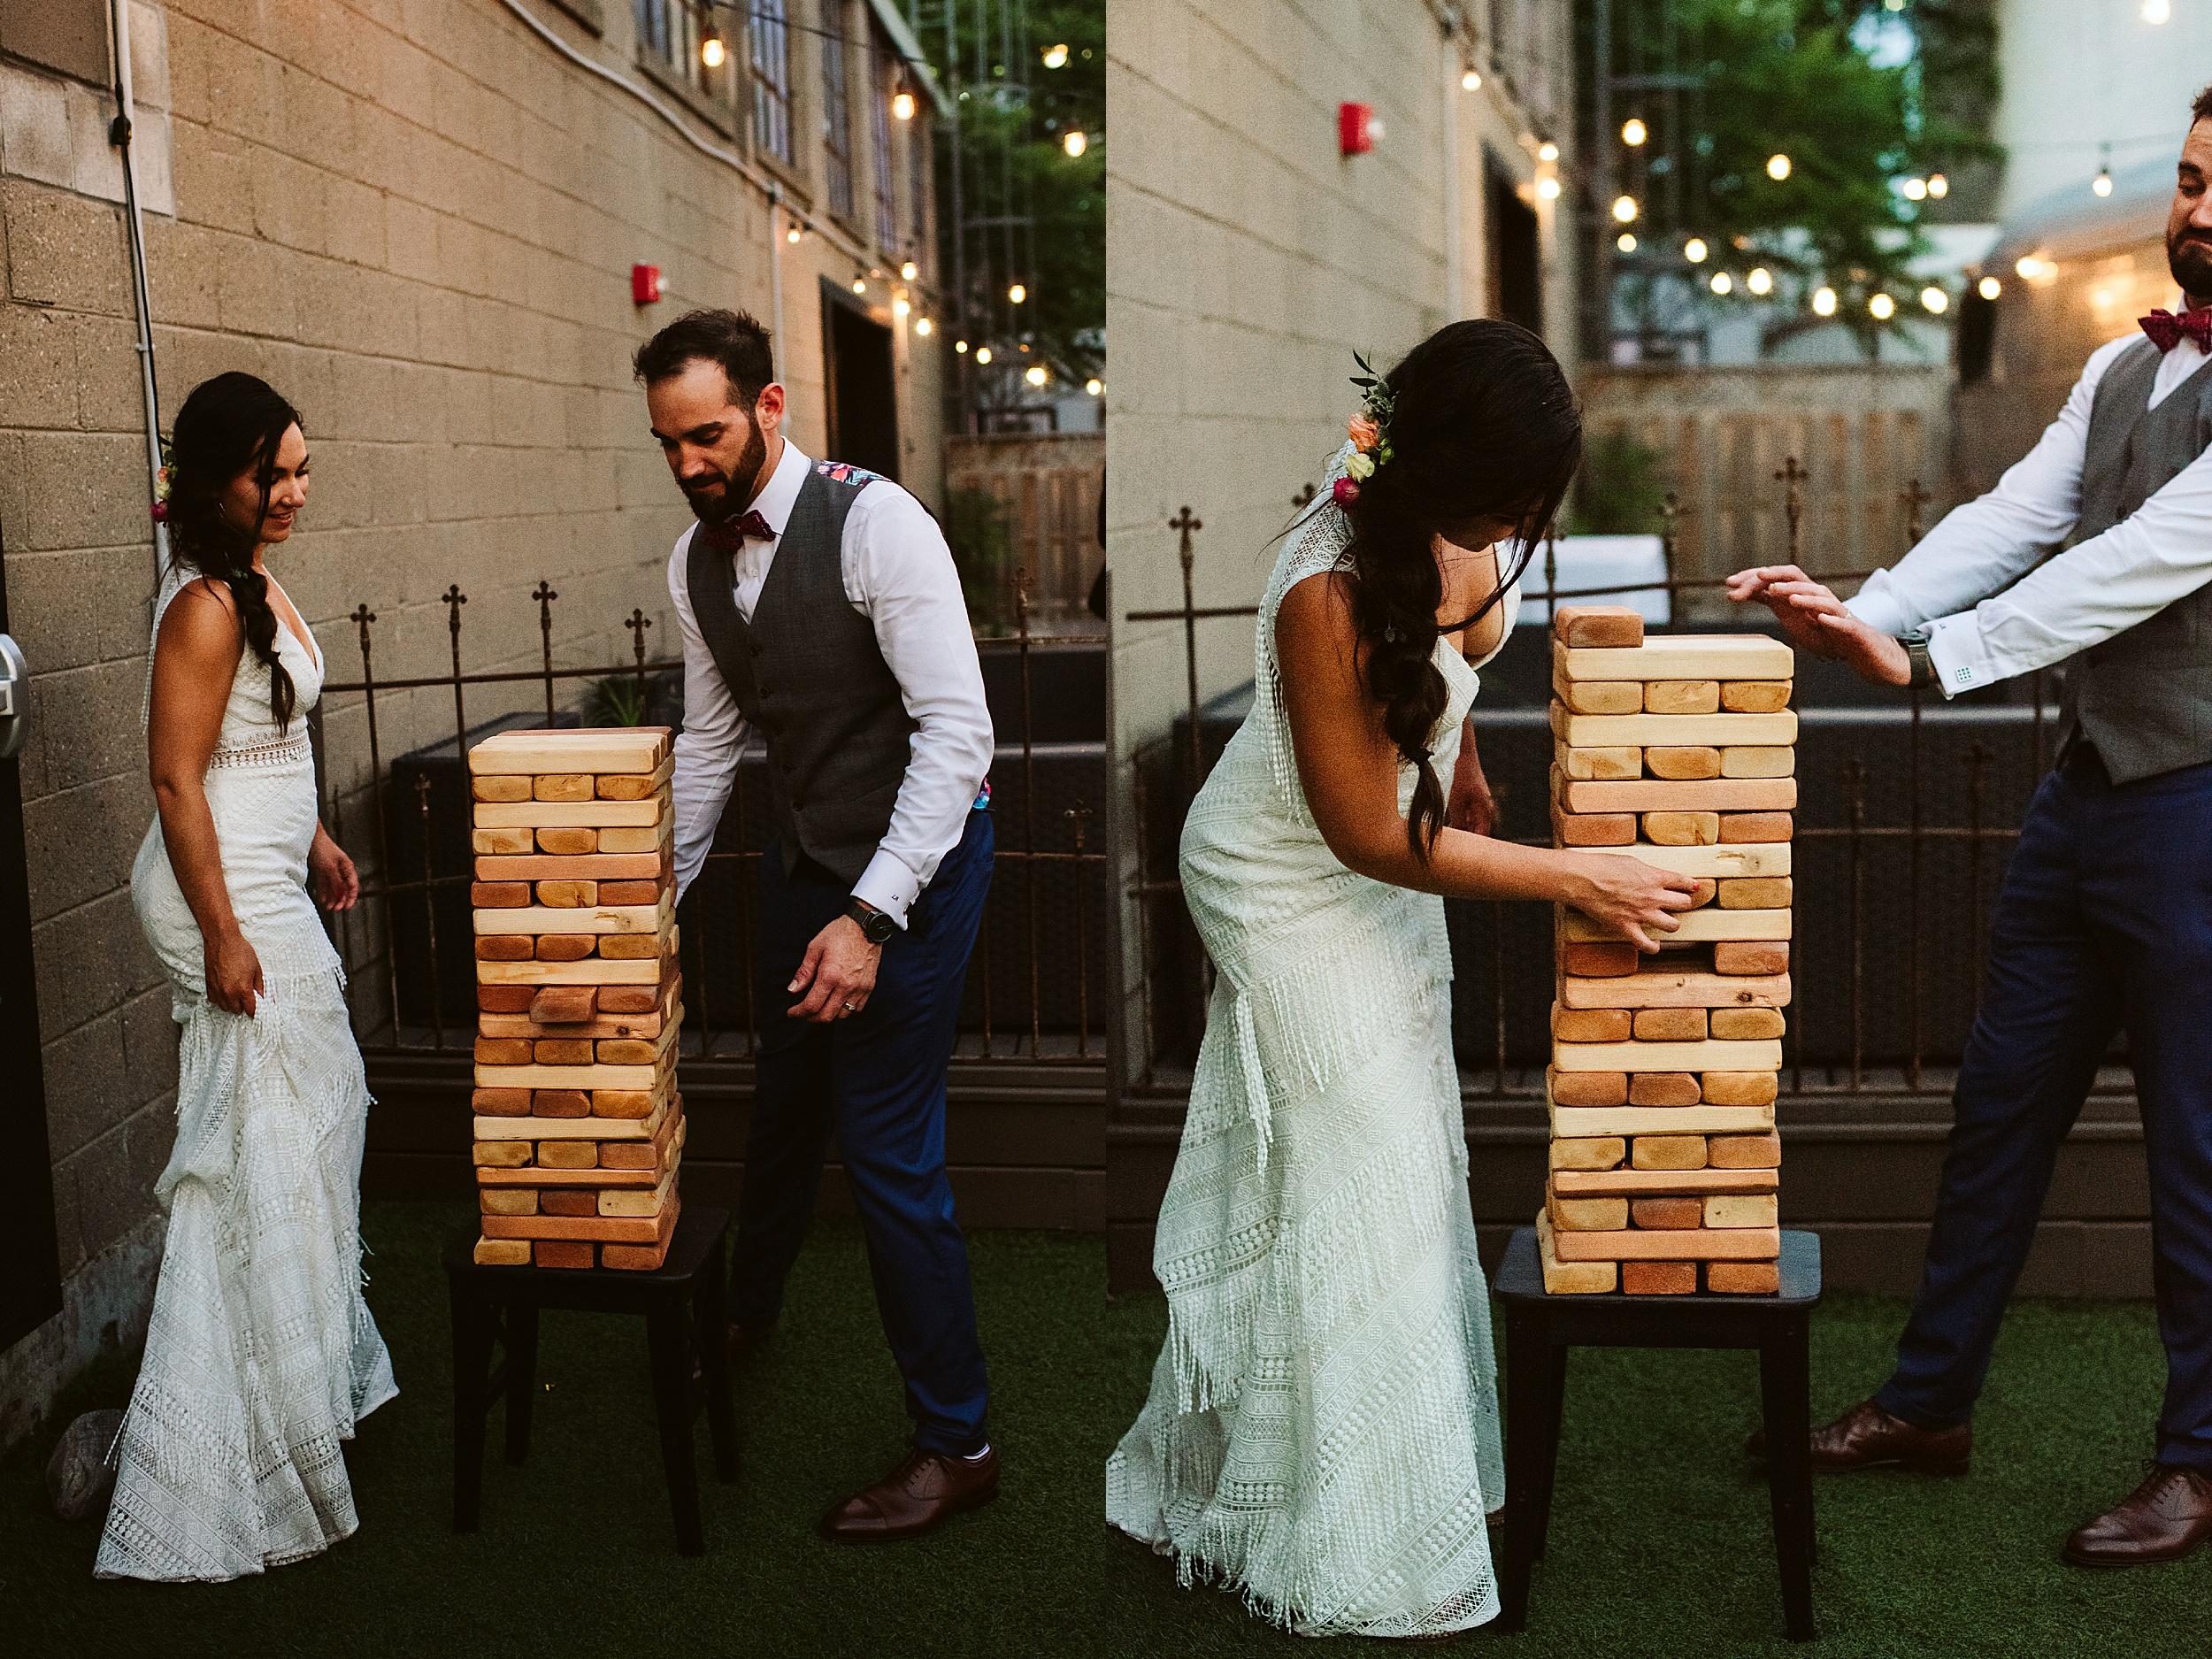 Airship-37-Berkeley-Events-Distillery-District-Wedding-Toronto-Wedding-Photographers_0052.jpg